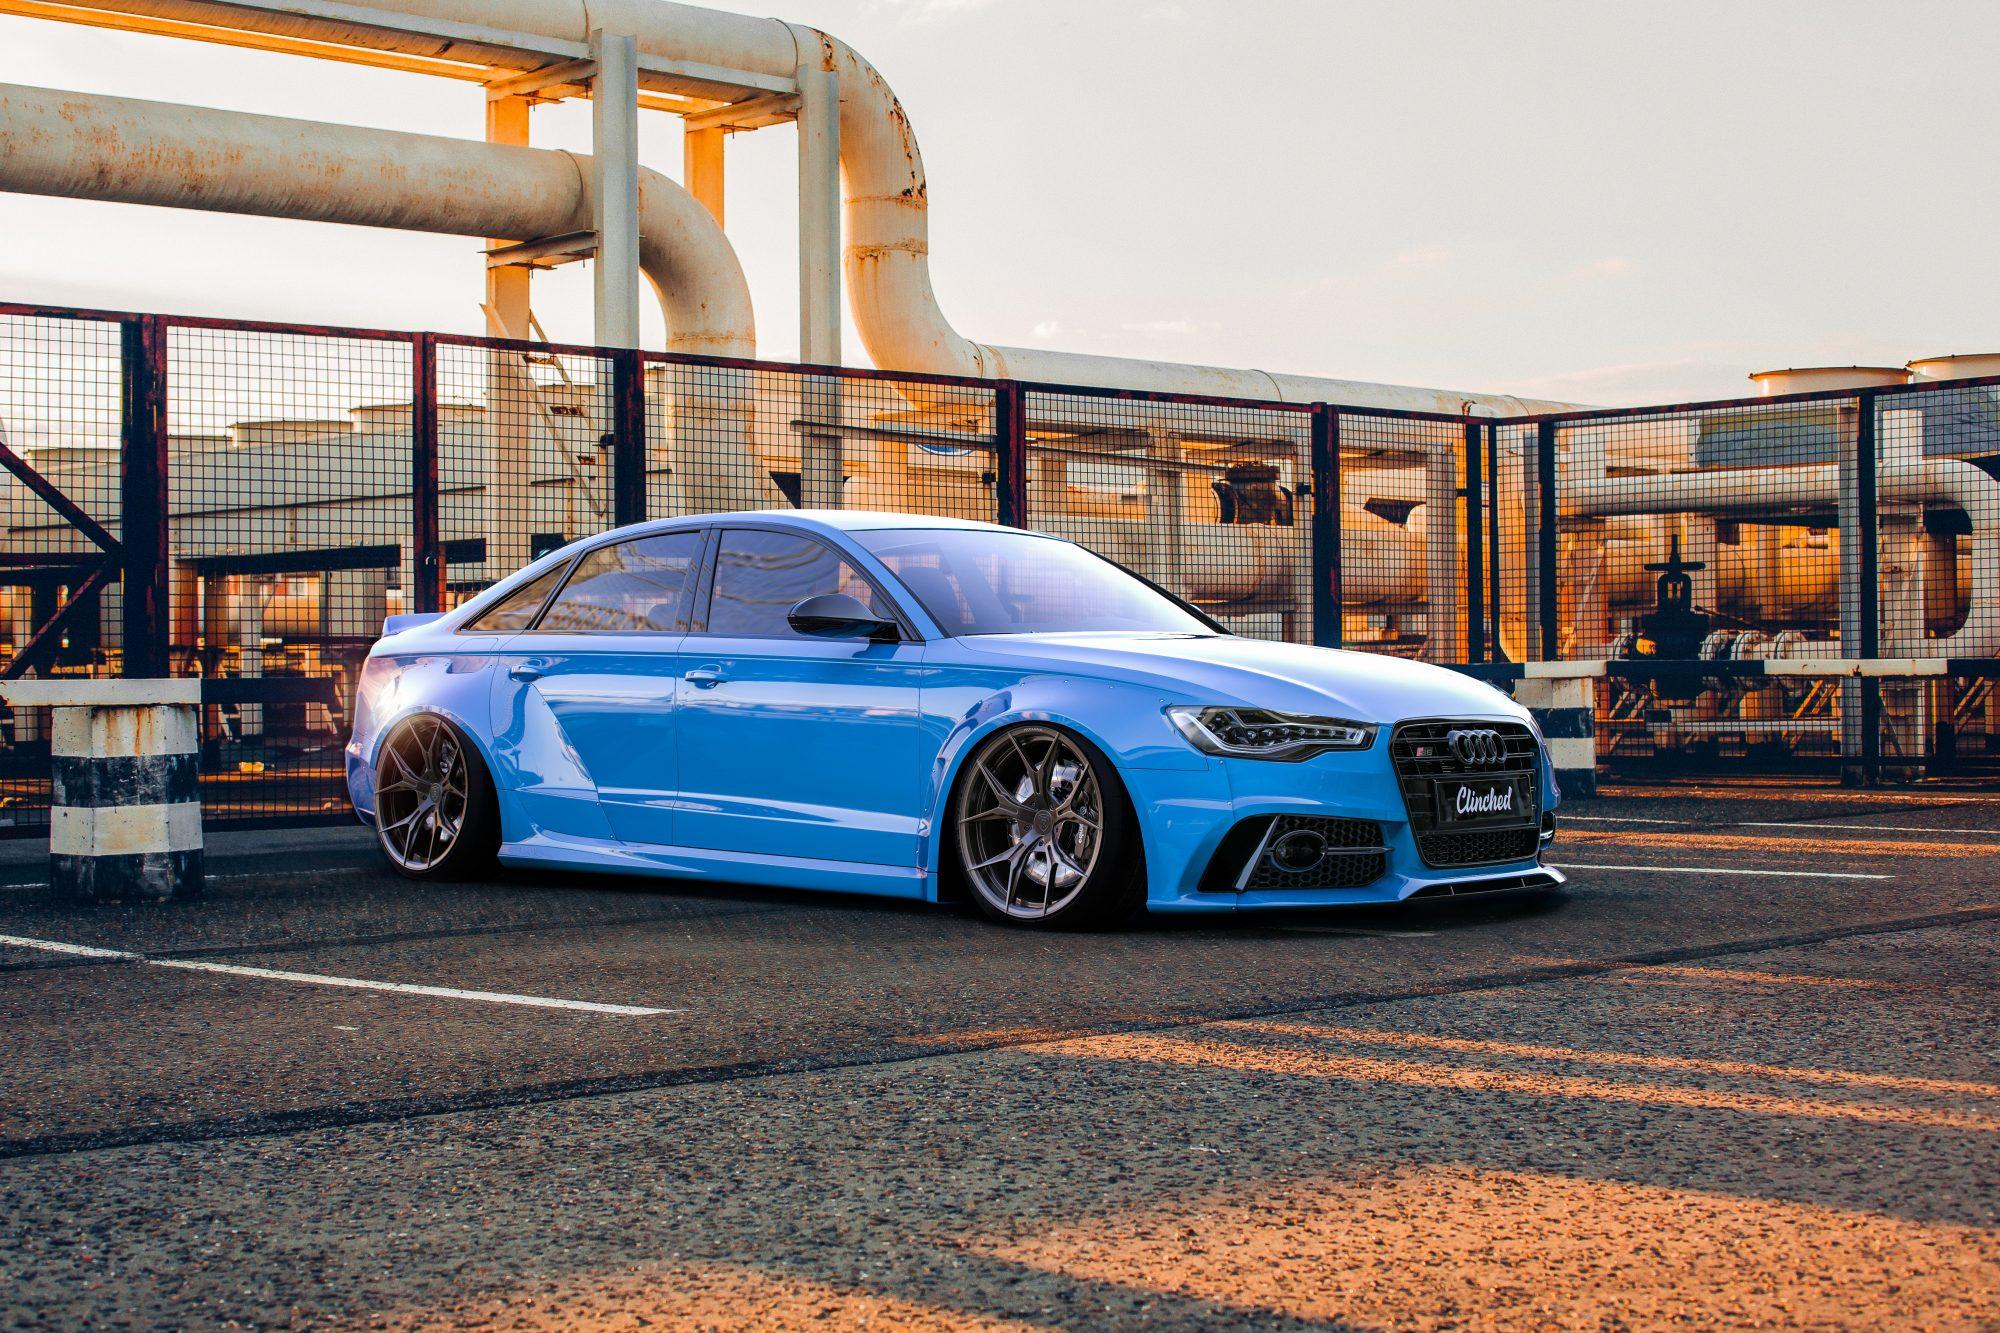 Audi A6 (C7) Widebody Kit - Widebody kit - FolieGejl dk